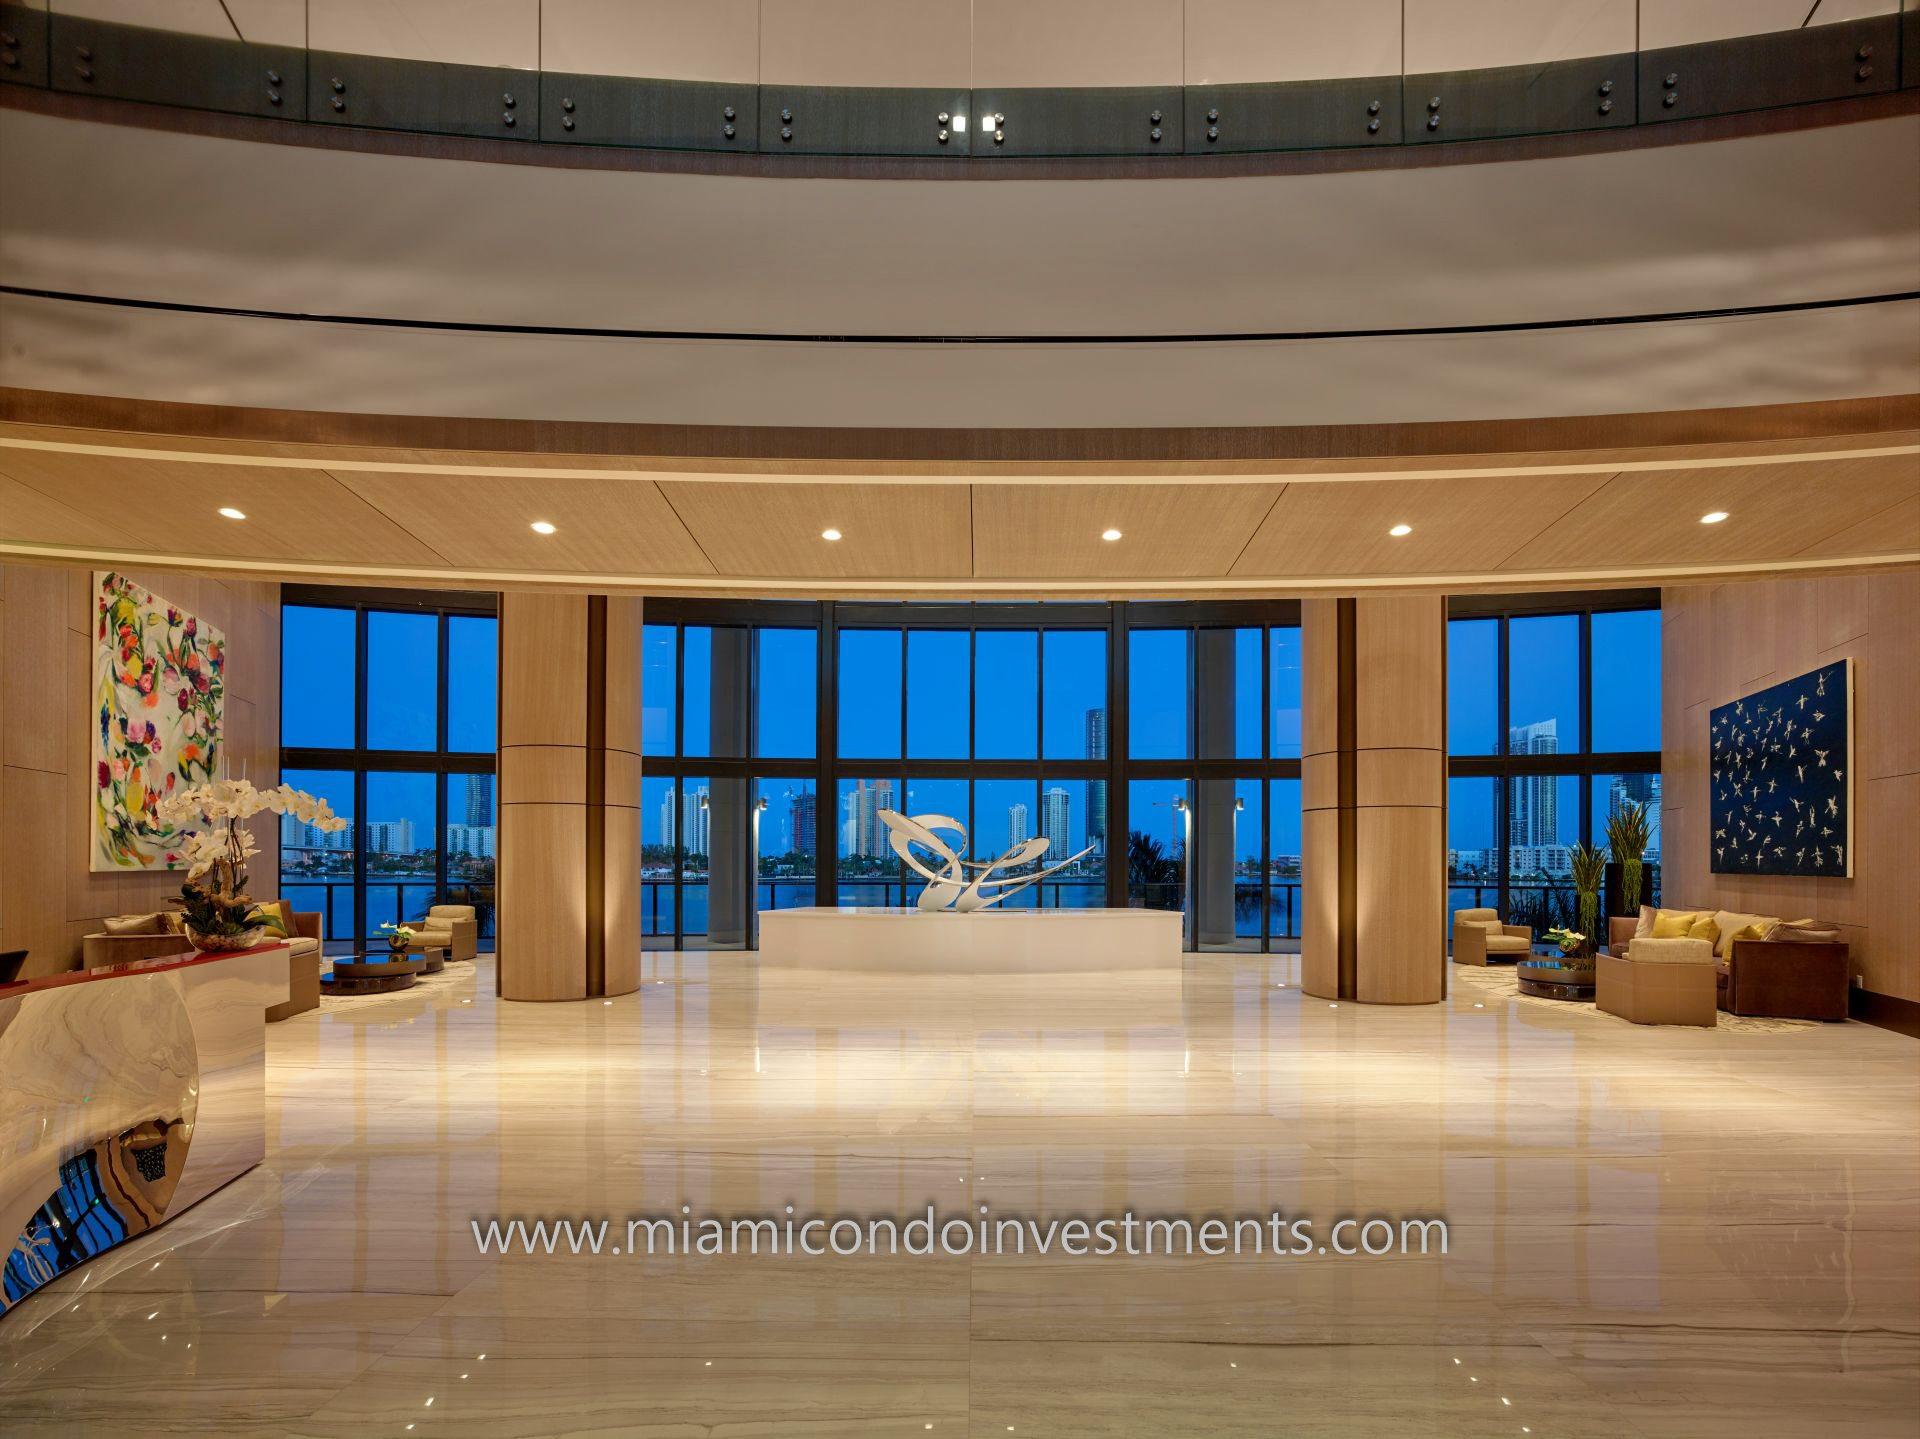 lobby at Prive condominiums